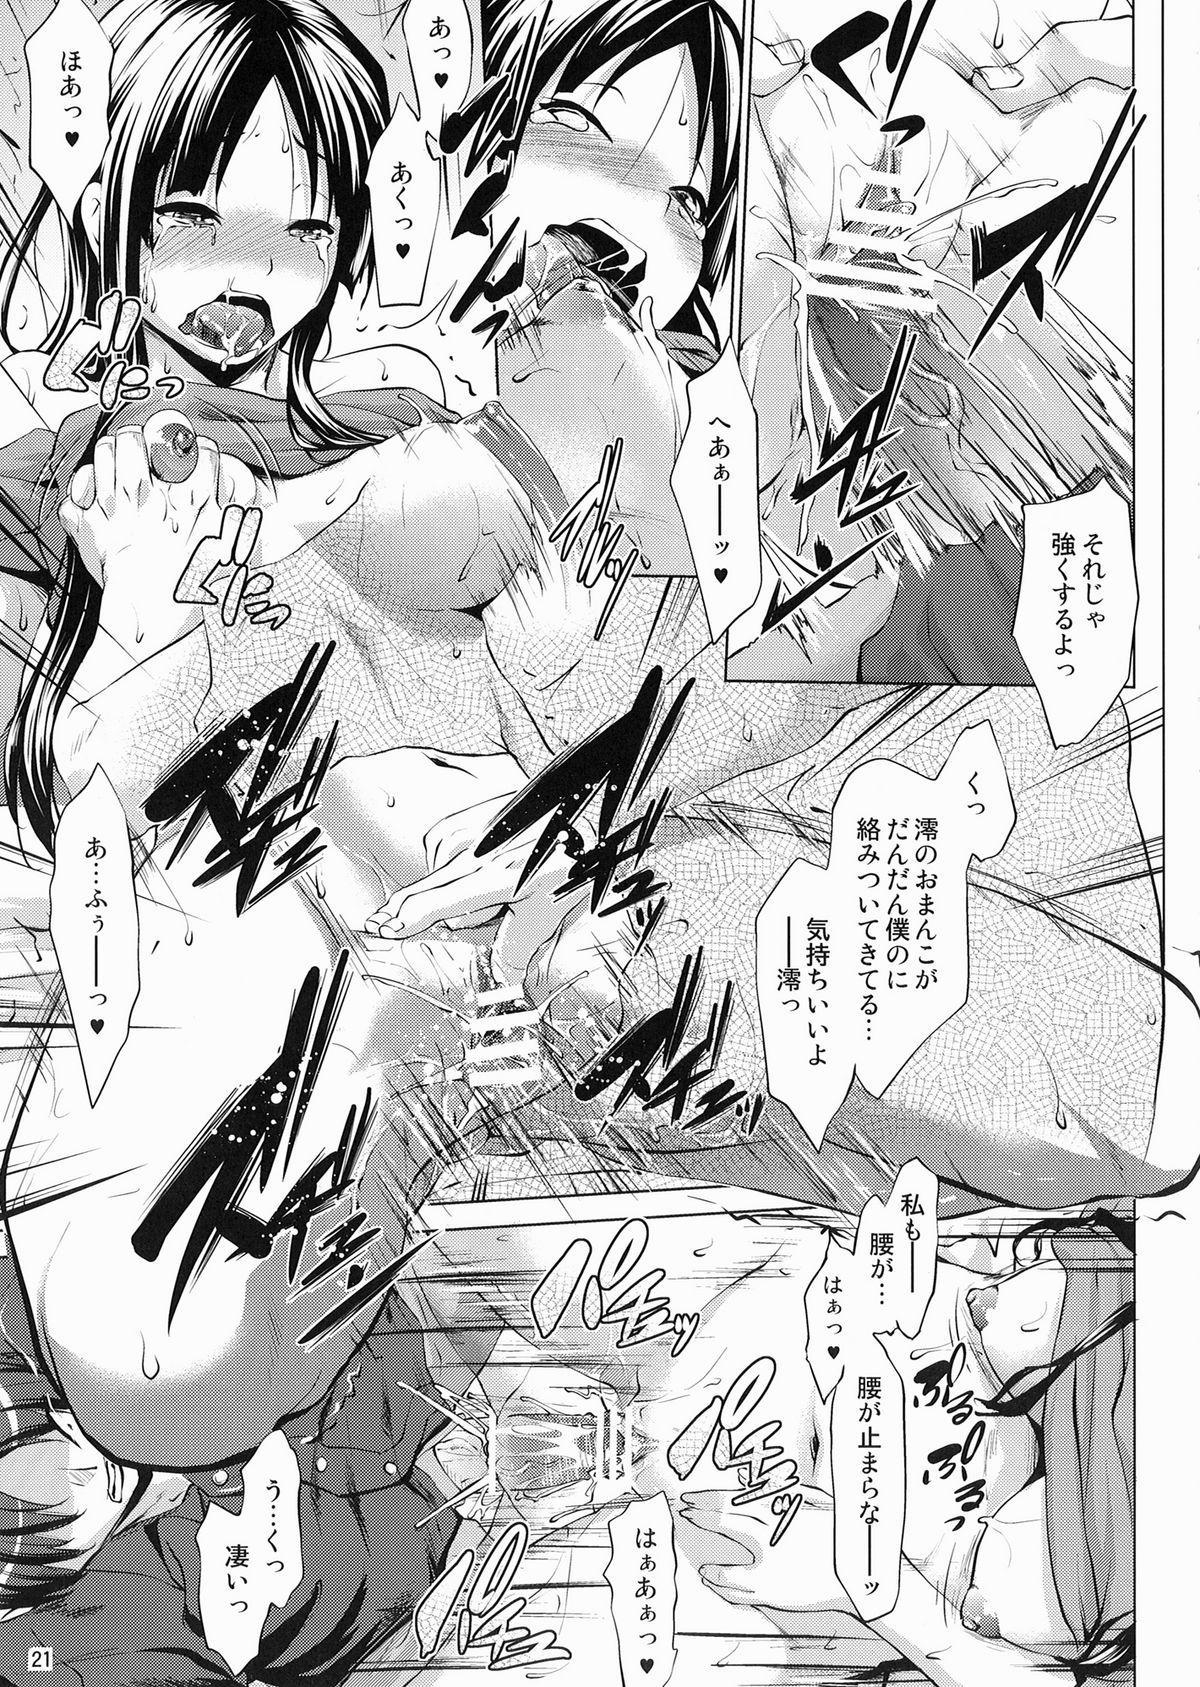 SukiSuki ☆ Elizabeth 20